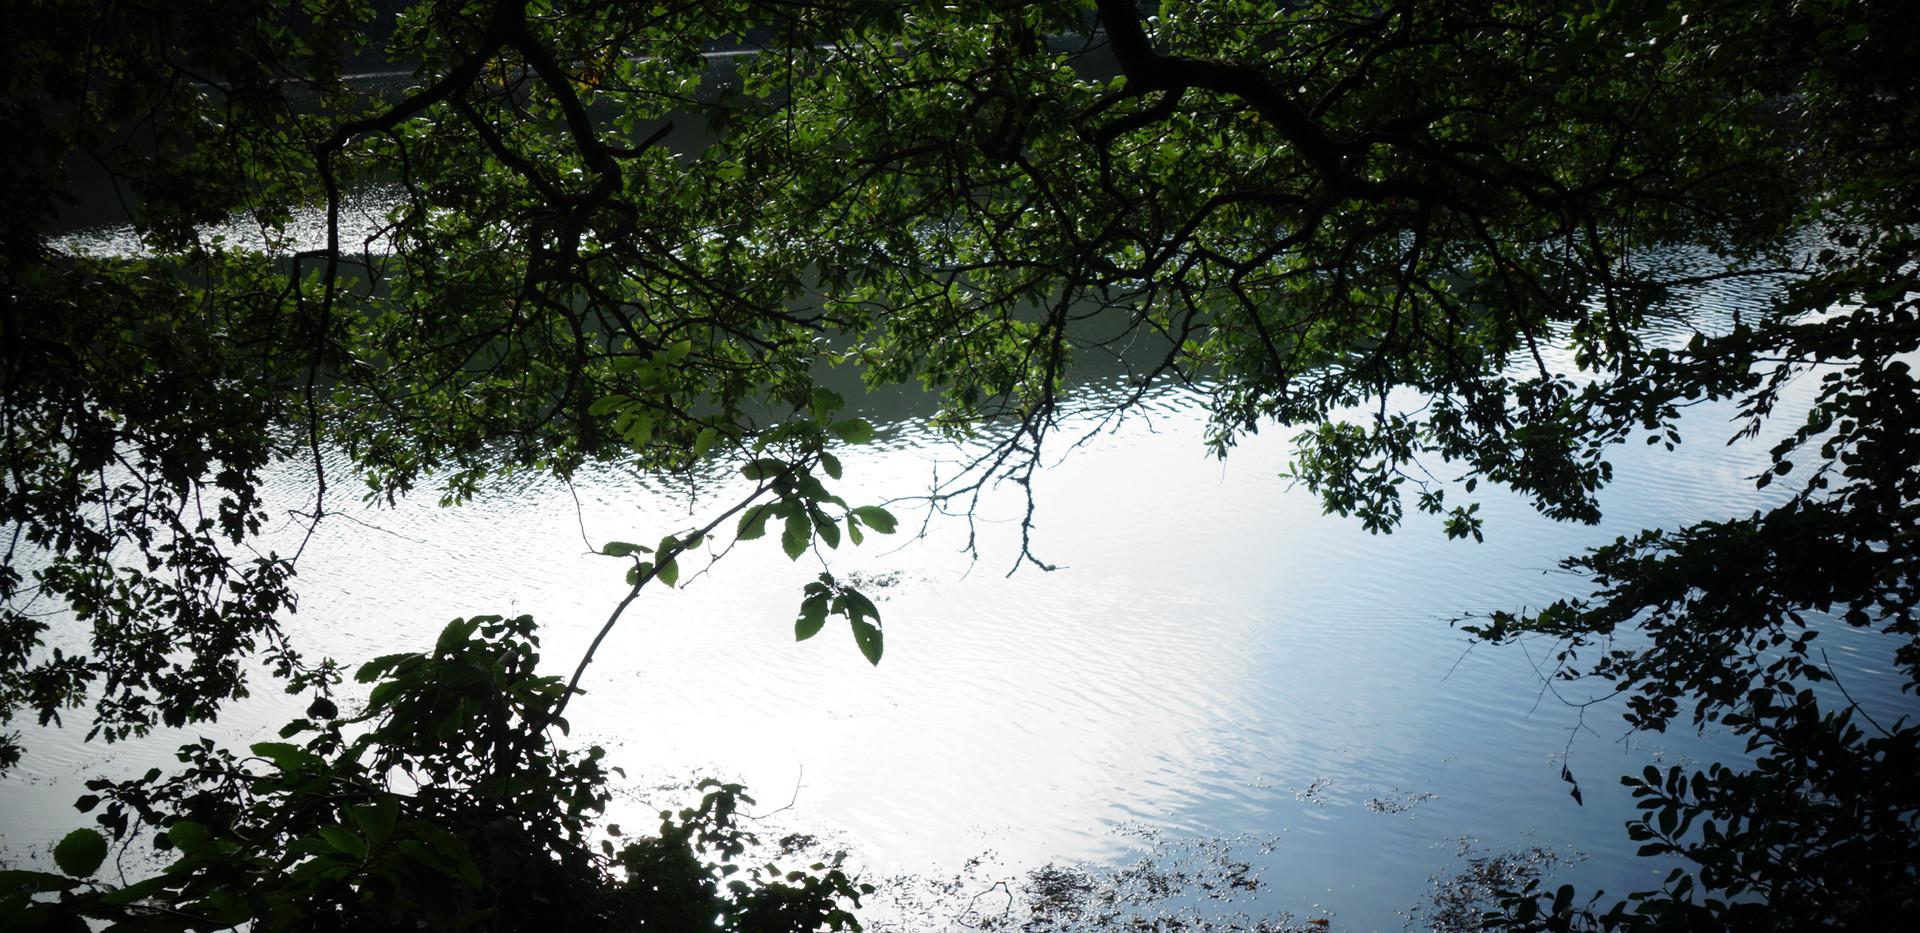 Camp is by the River Helford.JPG